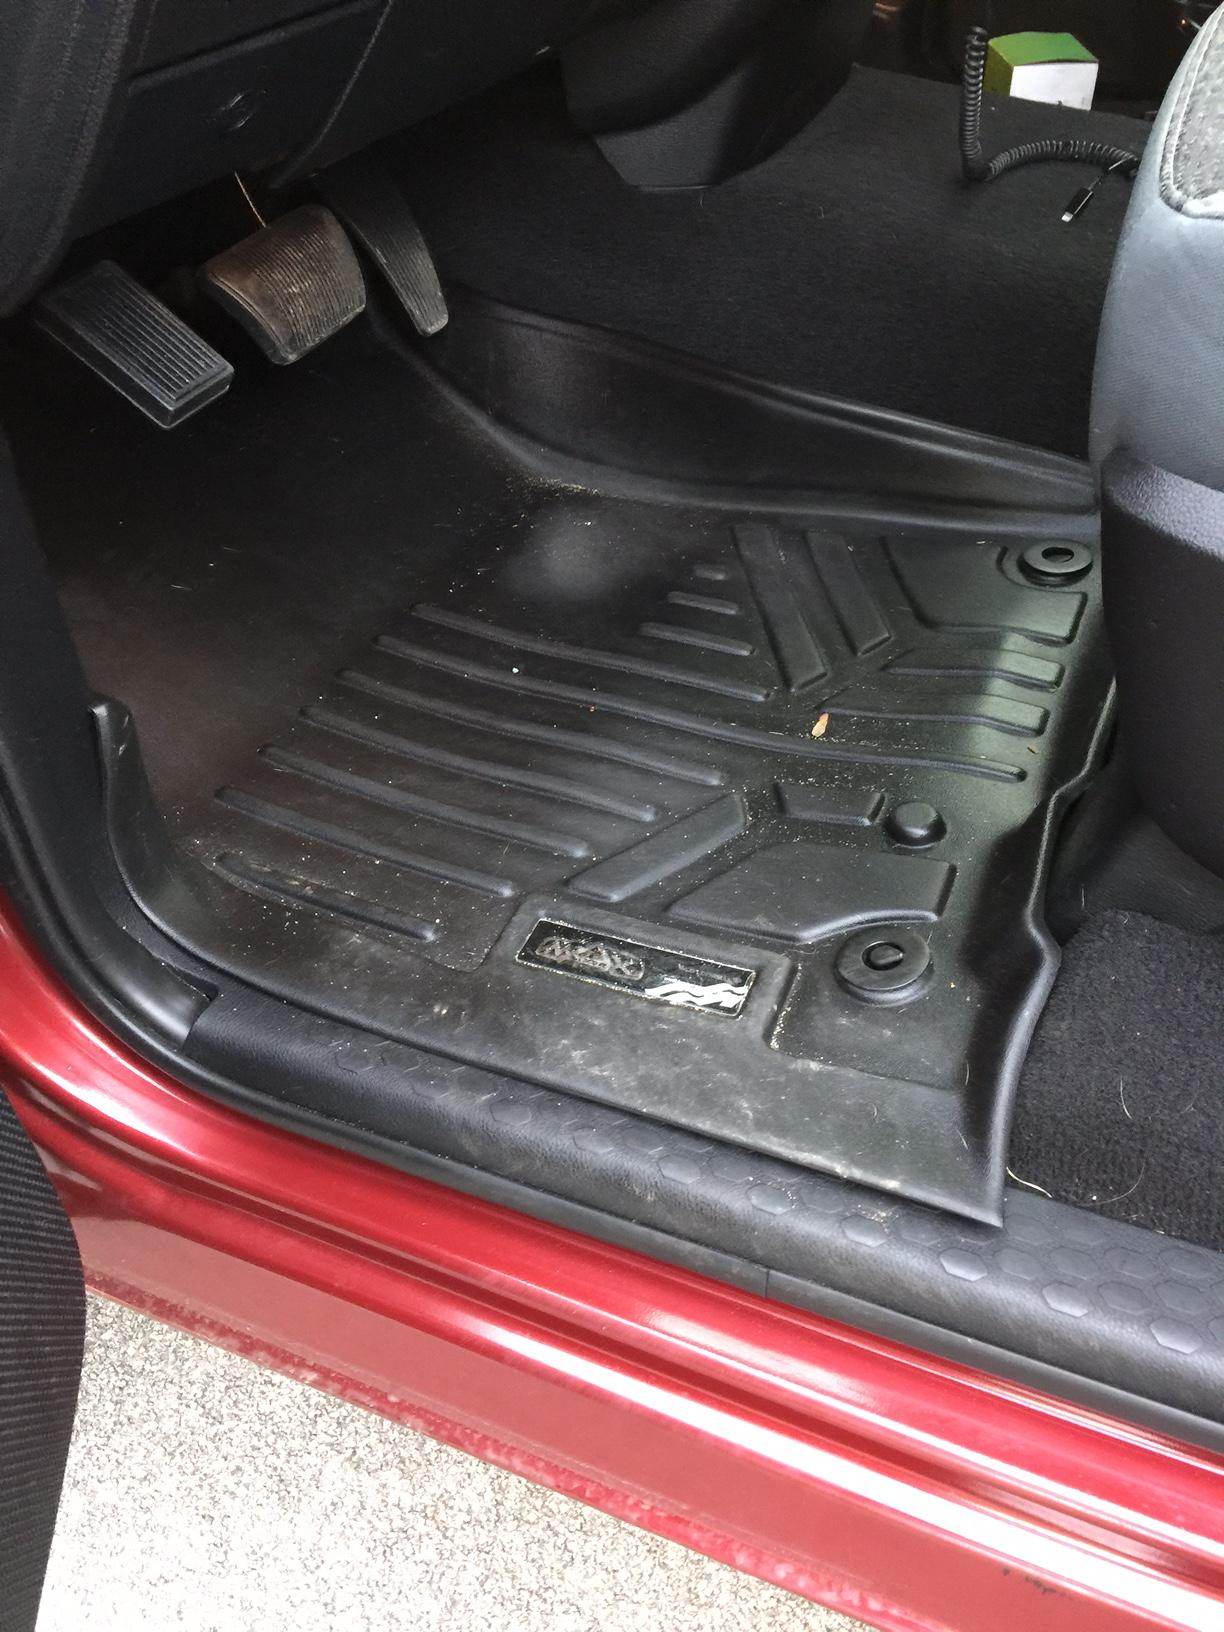 maxliner molded mats Celine luggage bag, Rust paint, Muffler